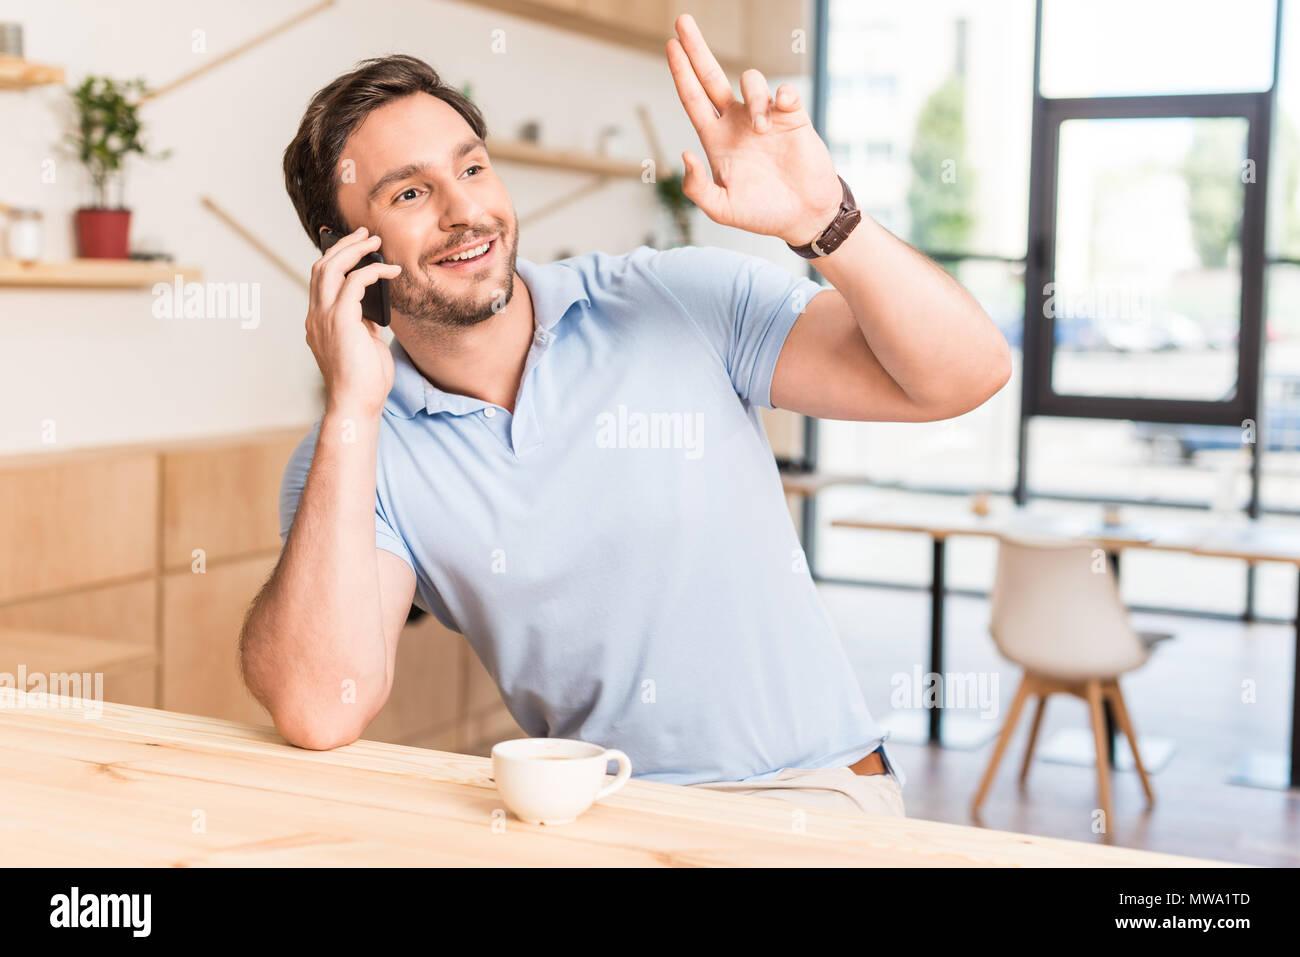 man calling for waiter or bartender in restaurant at bar counter - Stock Image